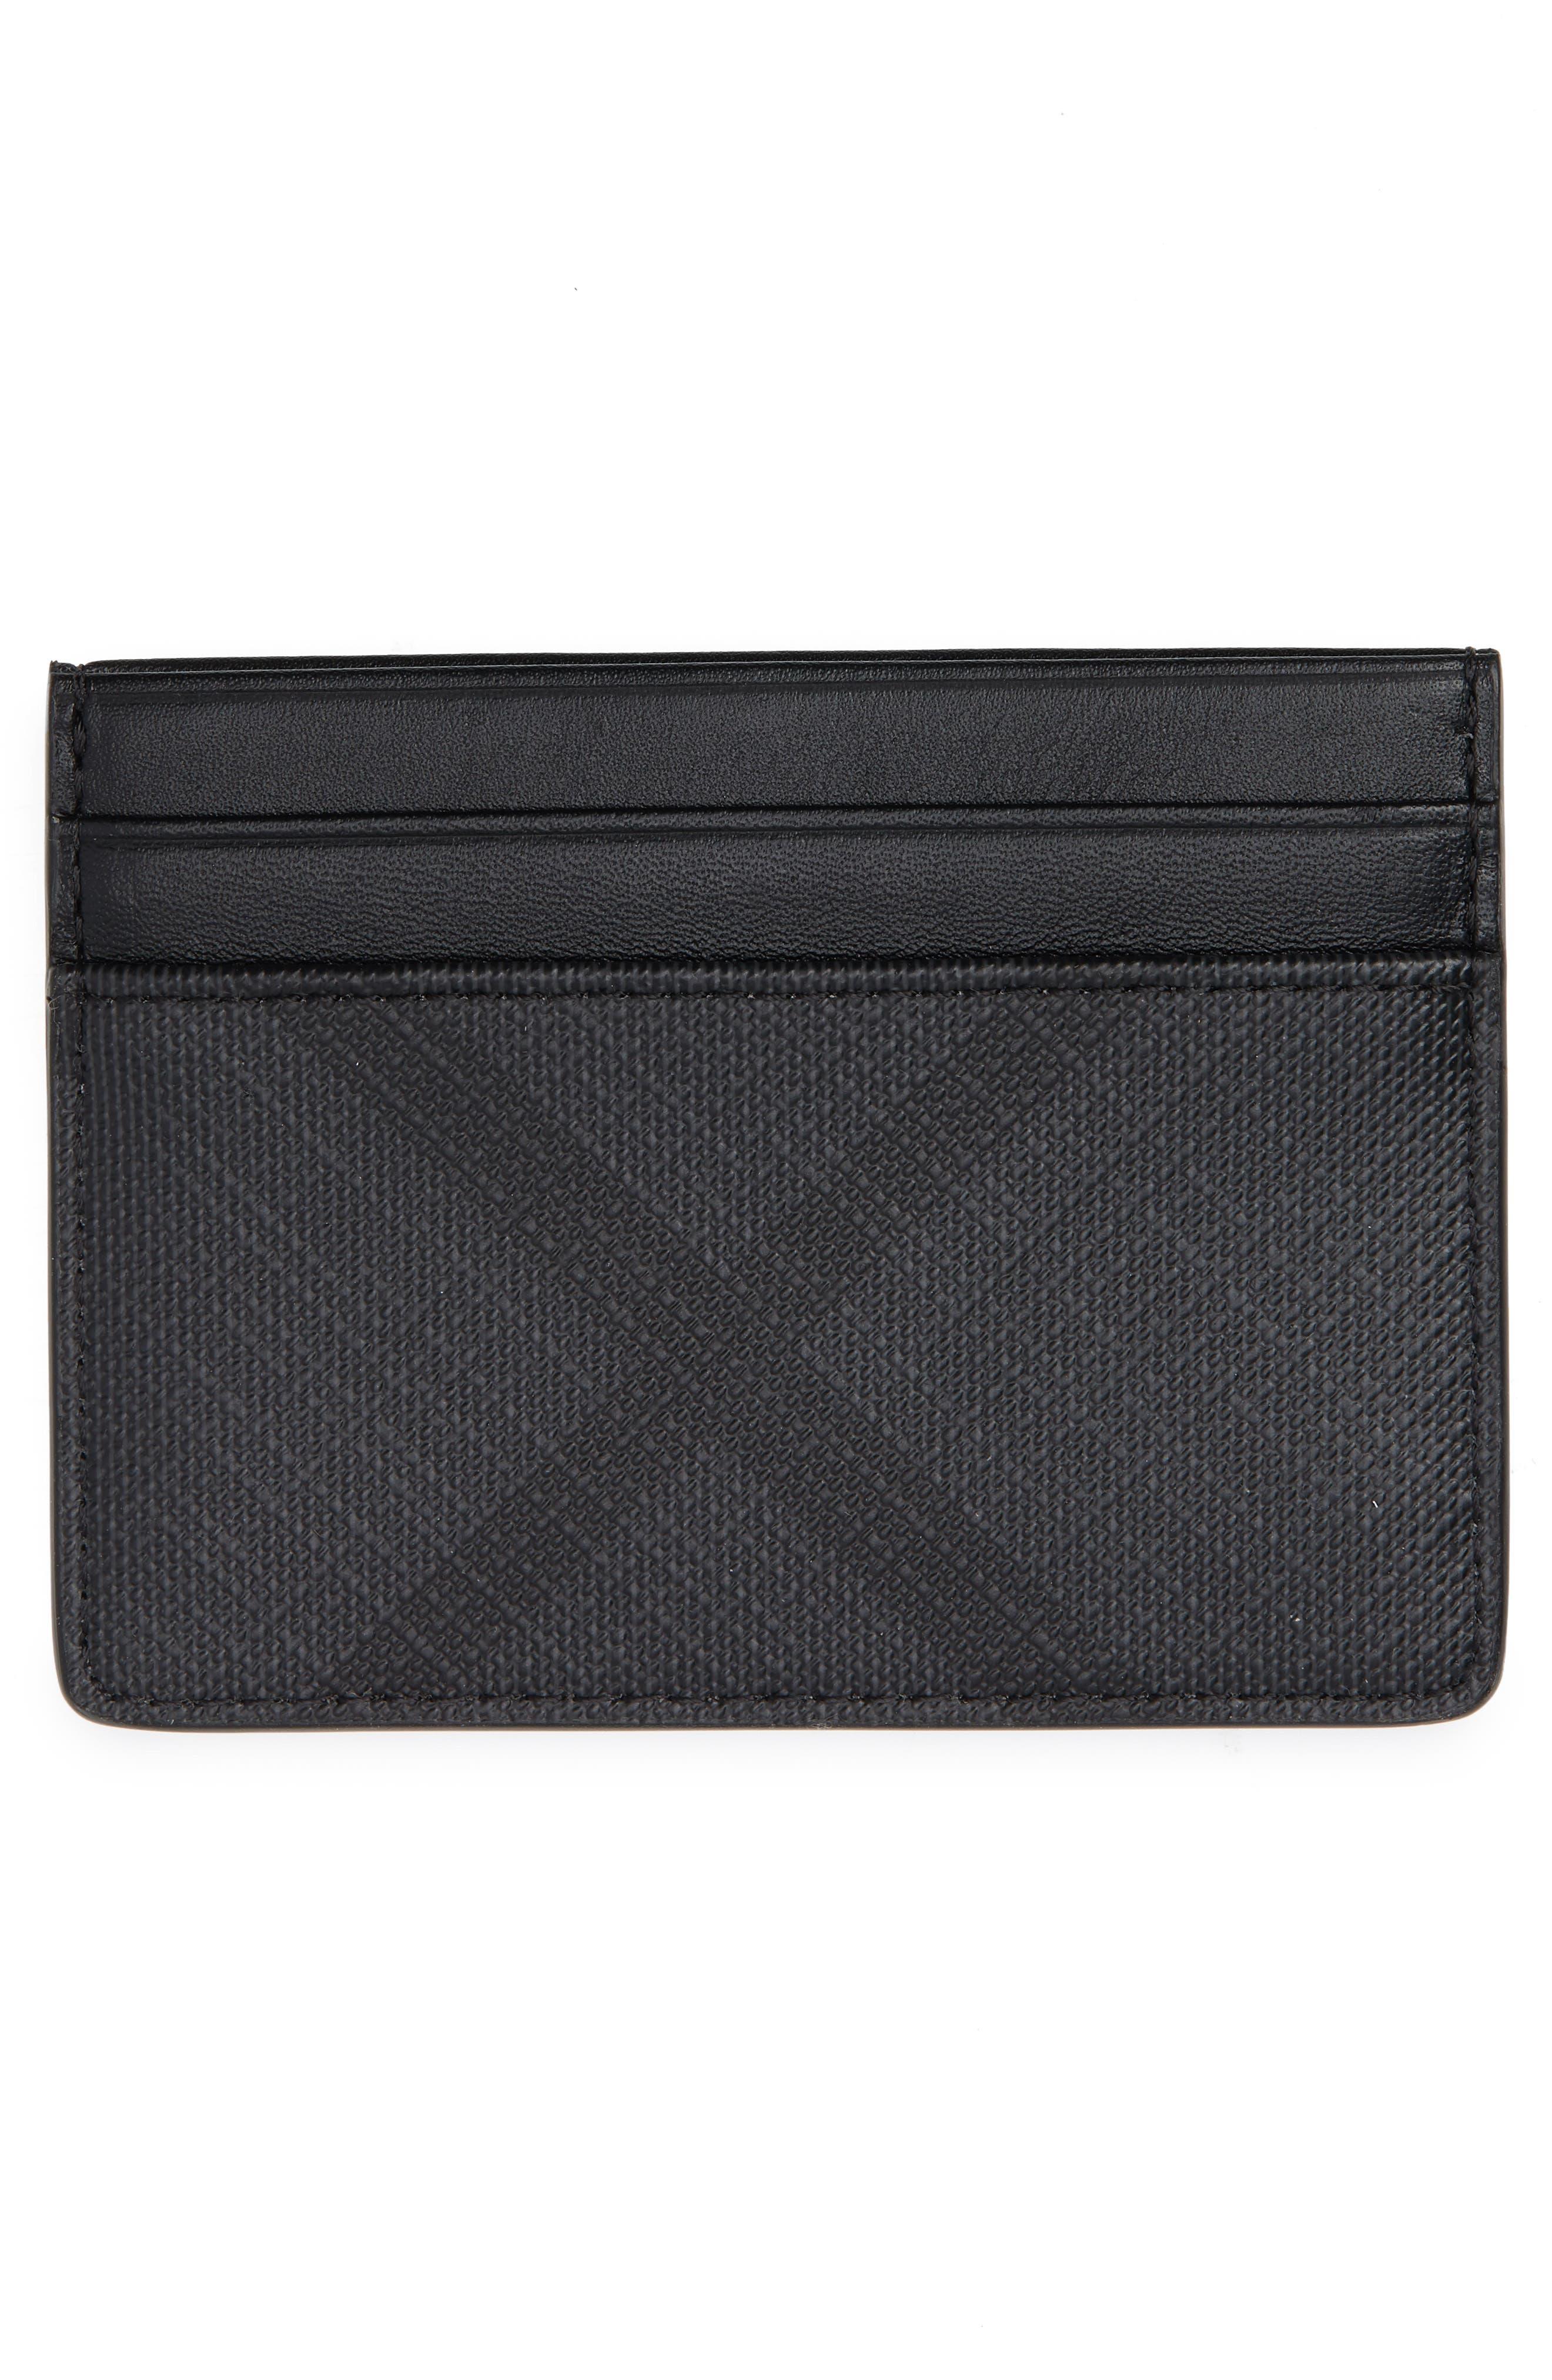 Sandon Check Faux Leather Card Case,                             Alternate thumbnail 2, color,                             CHARCOAL/ BLACK